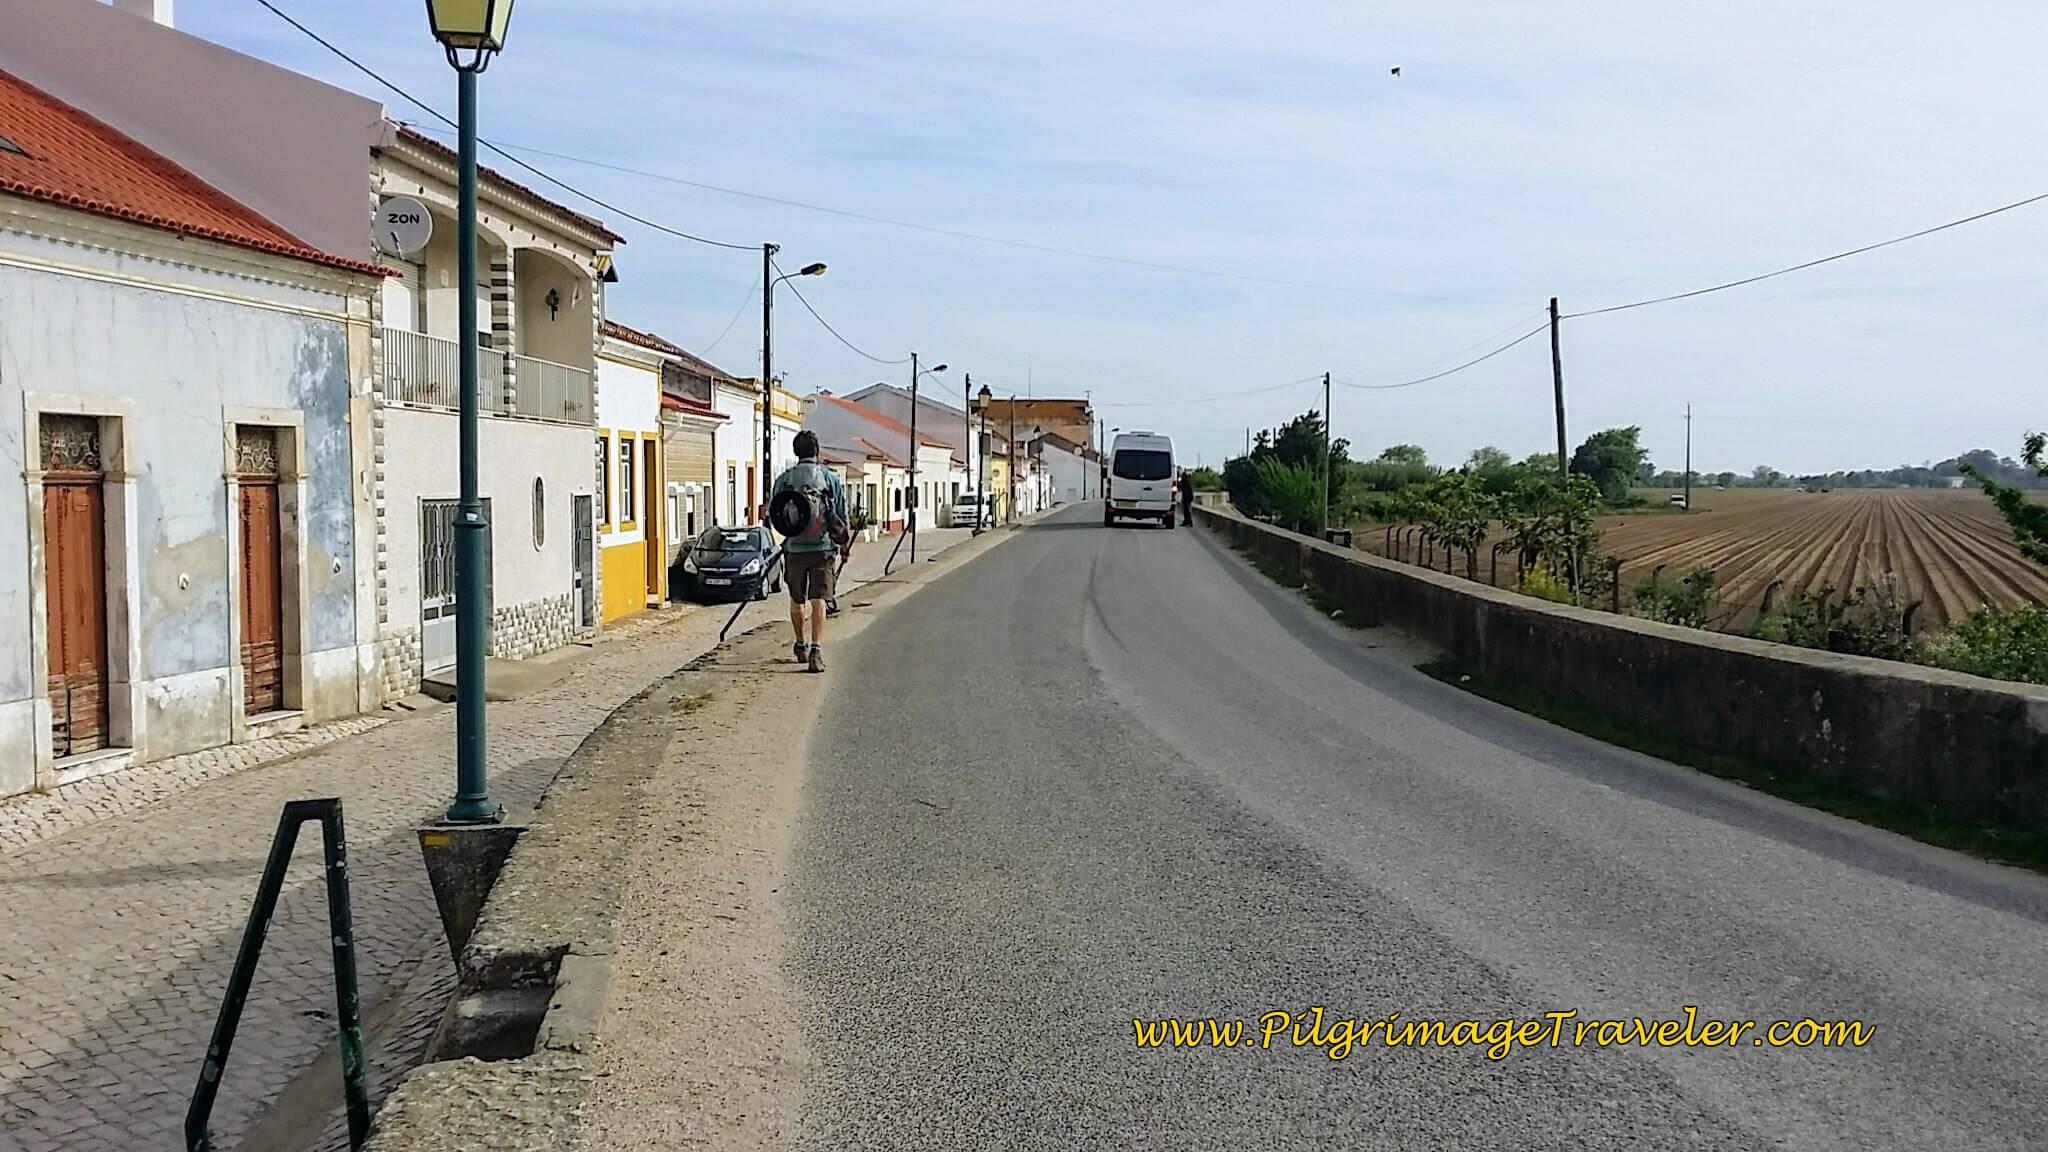 Río Tejo Dike Through Town